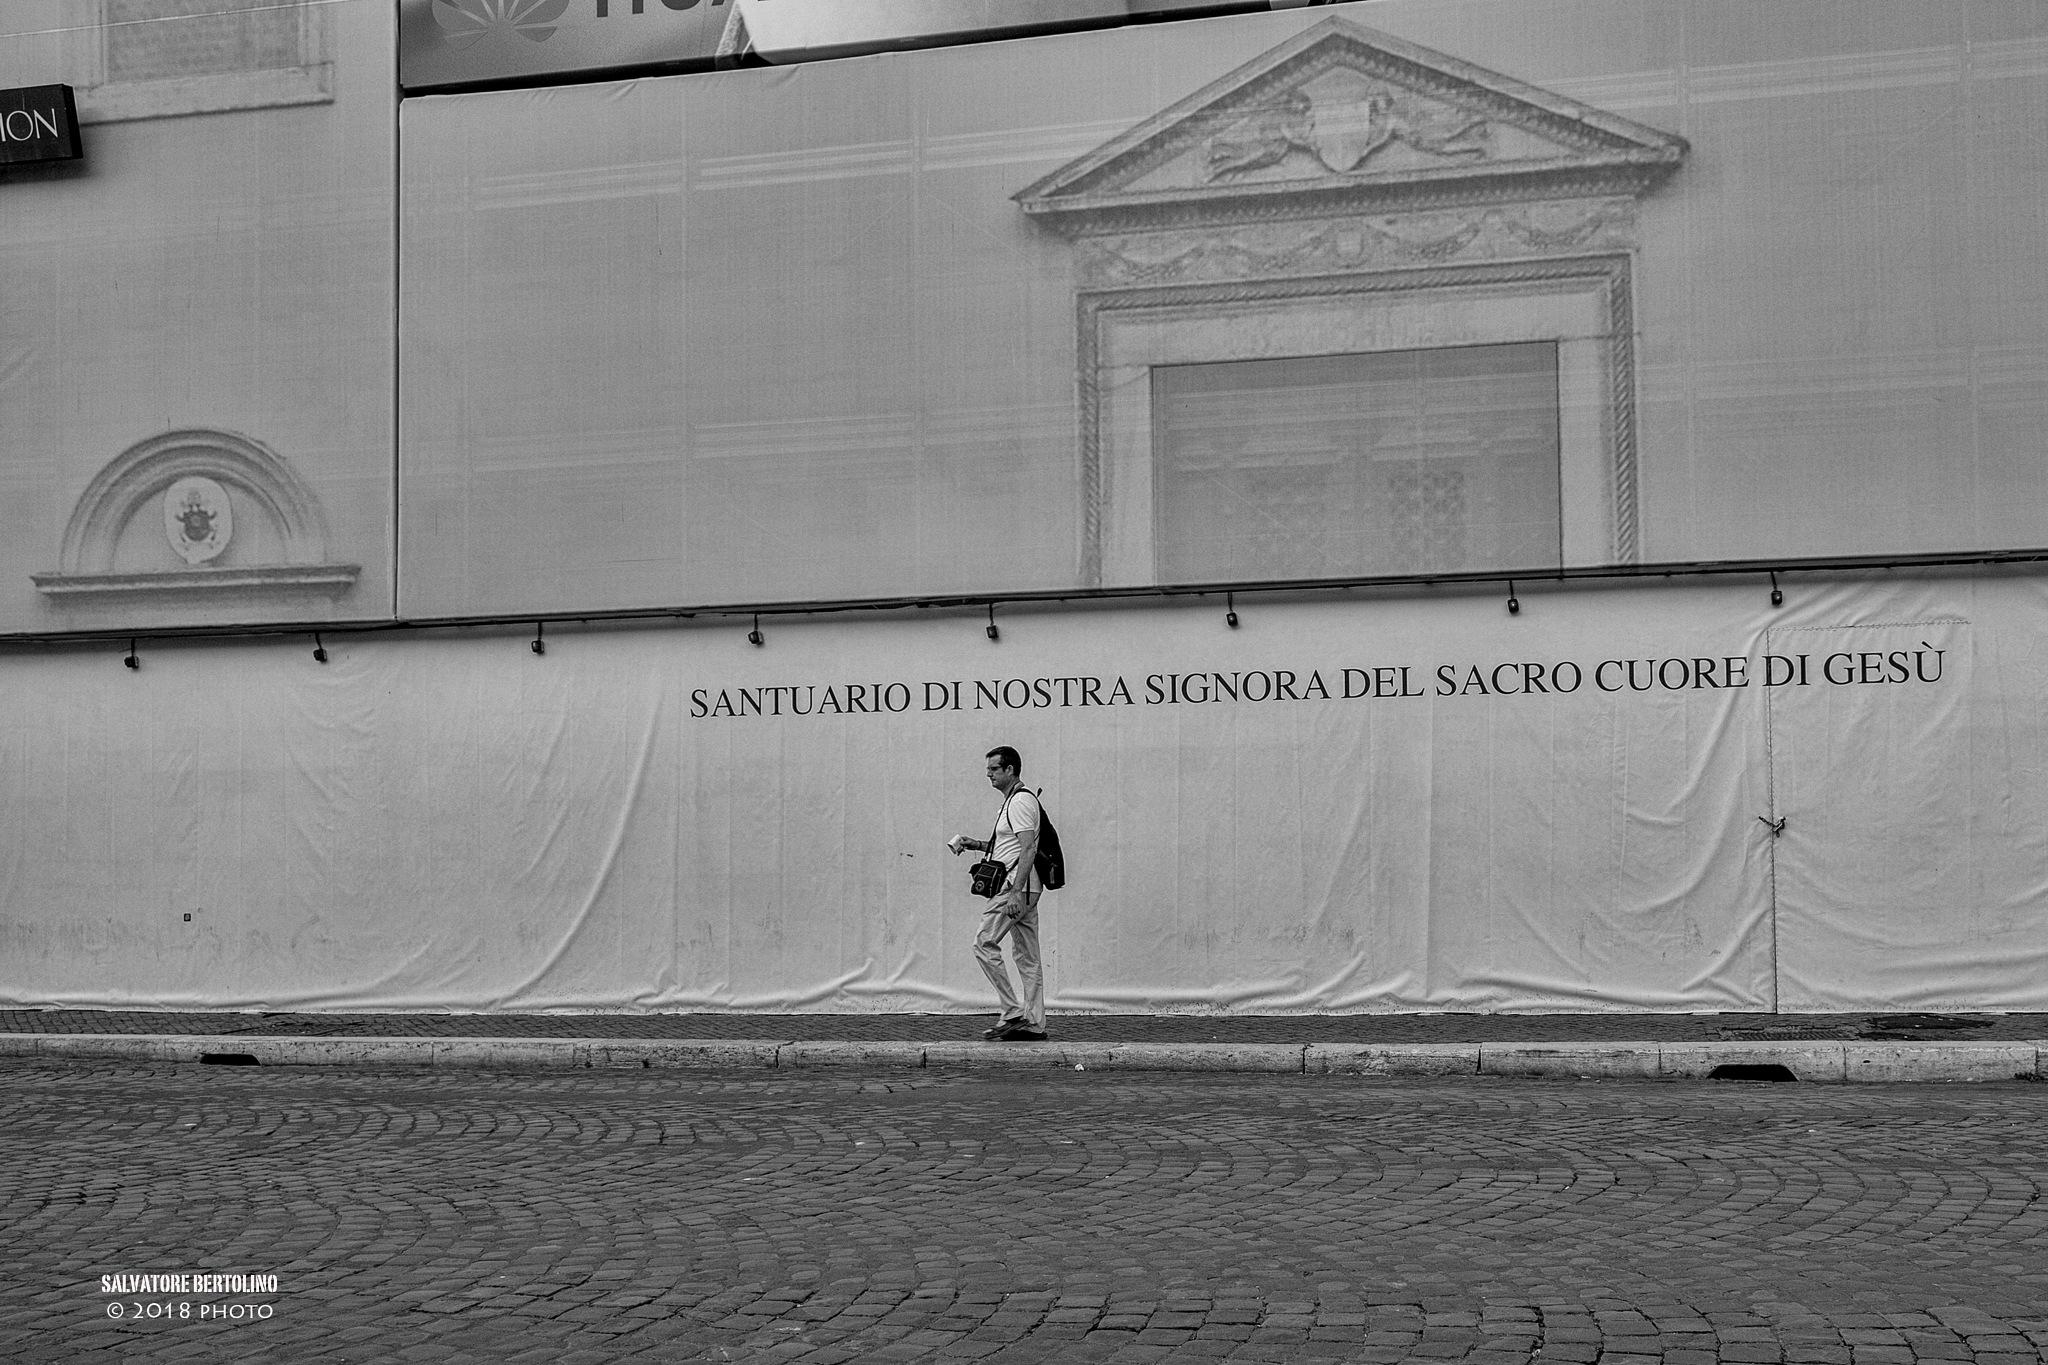 Solitario a piazza Navona by Salvatore Bertolino